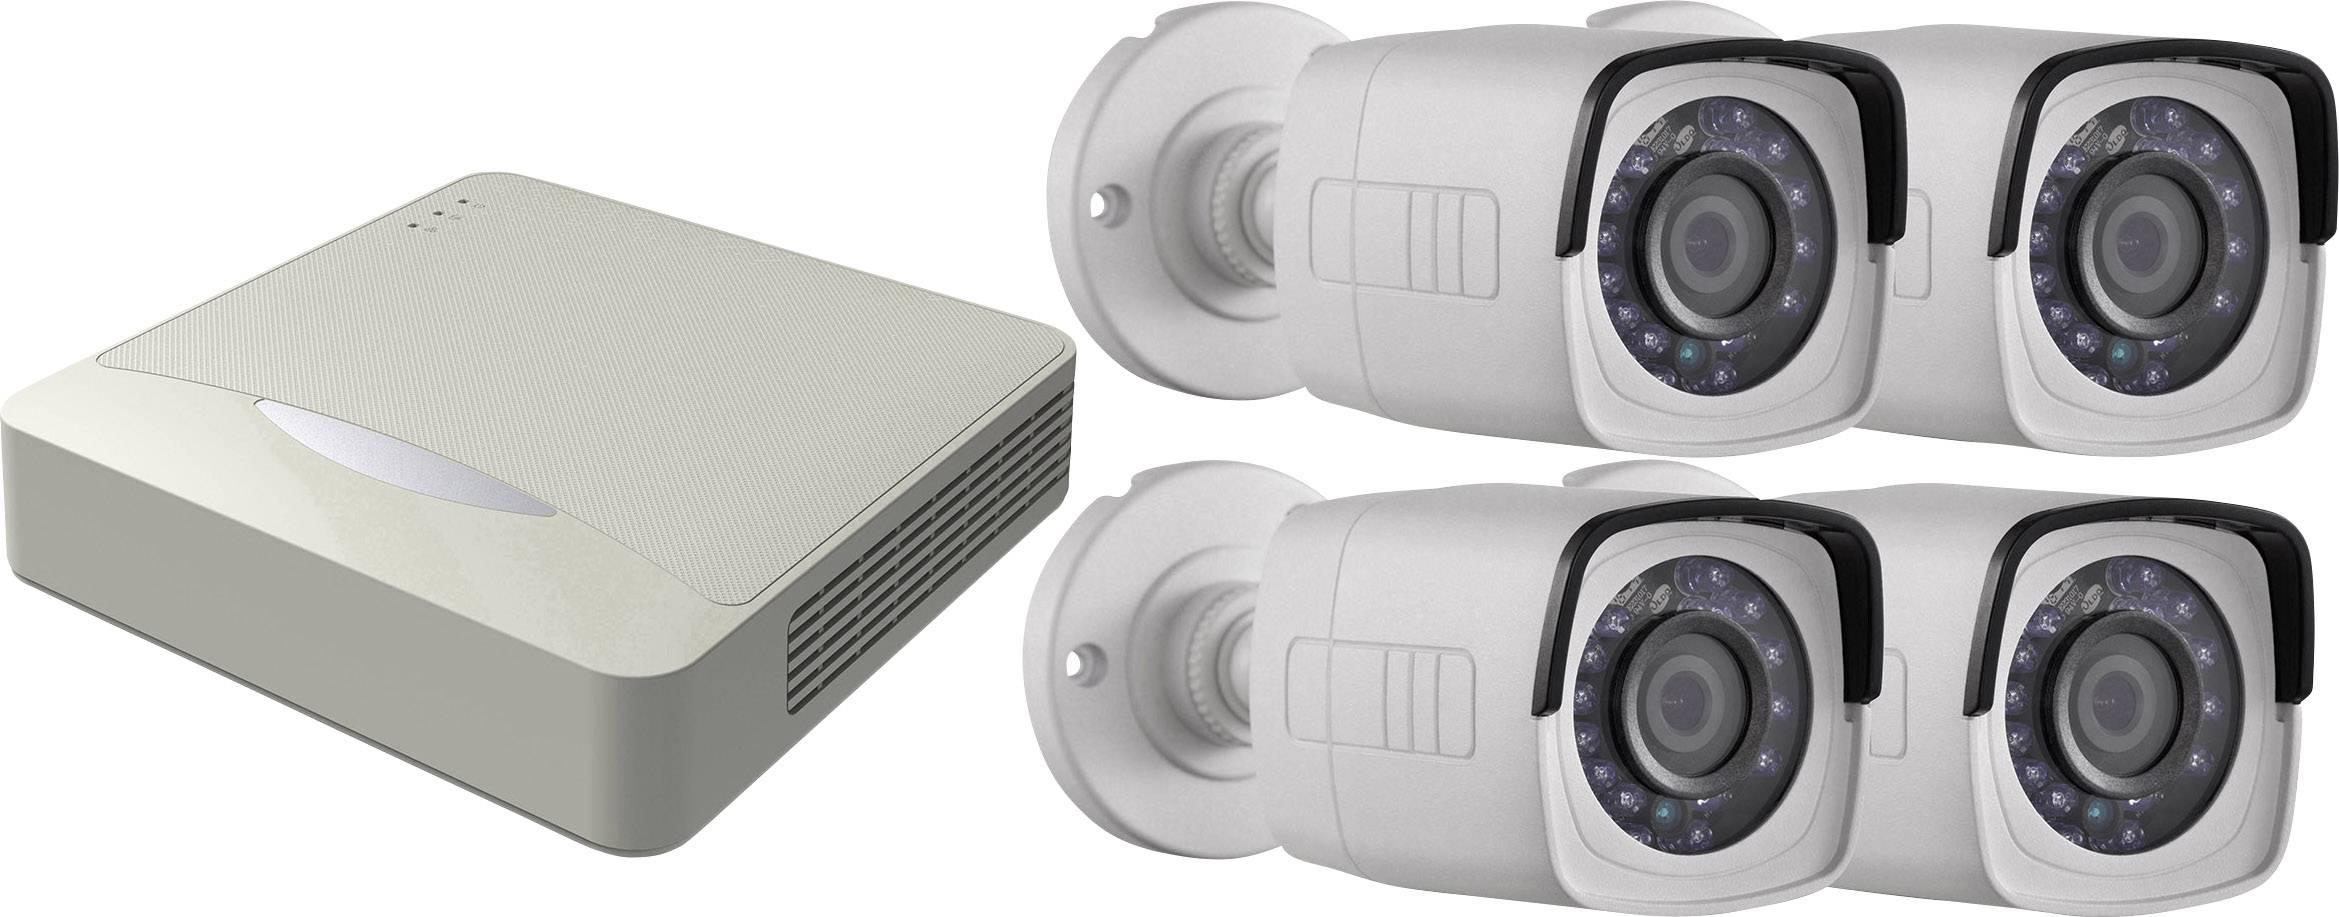 Sada bezpečnostnej kamery HiWatch DS-H104Q + DS-T200 4-kanálová